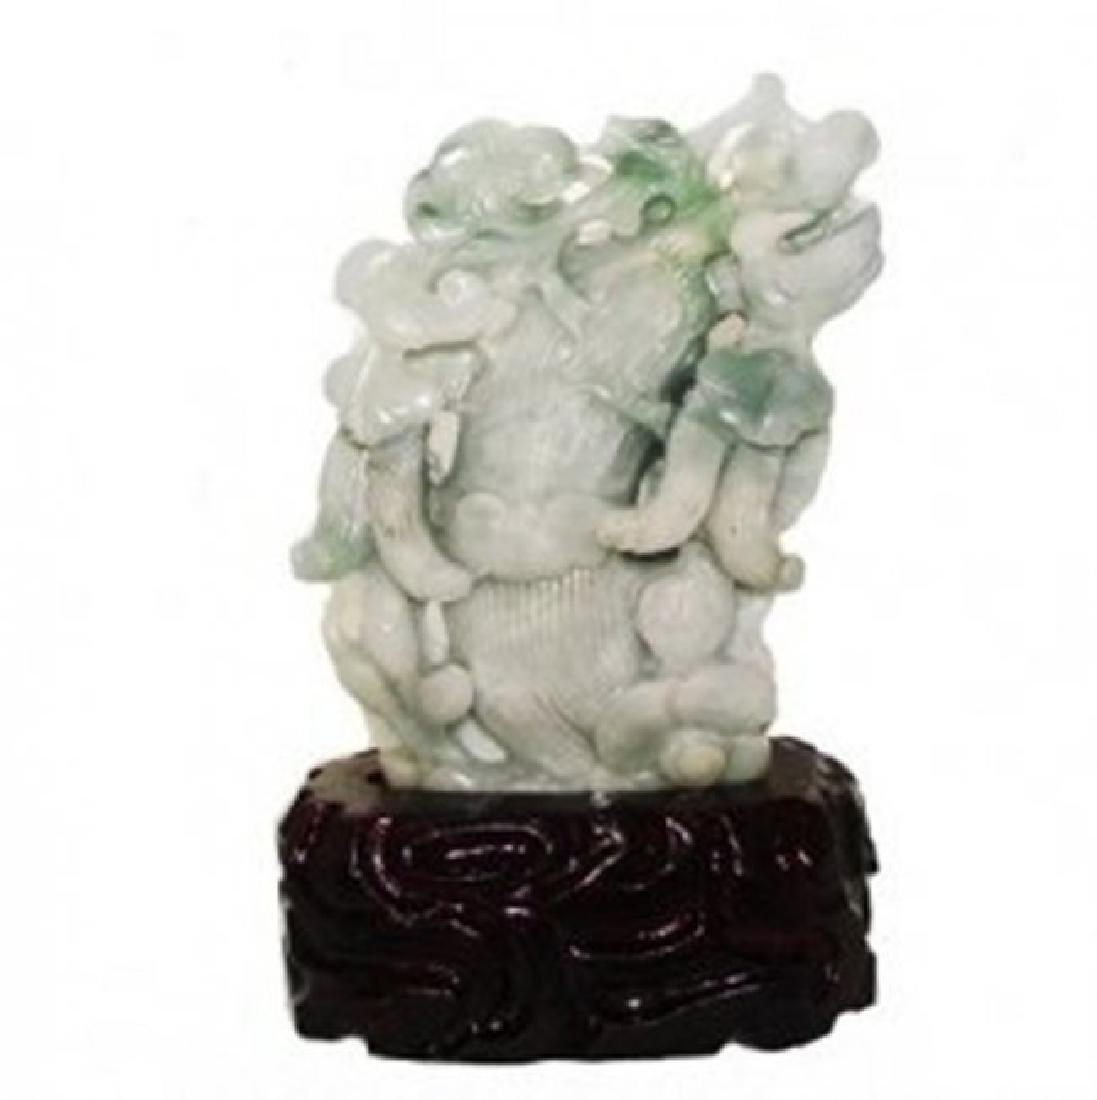 19th Century Jade Hand Carved Squash Weight: 1.7 pound